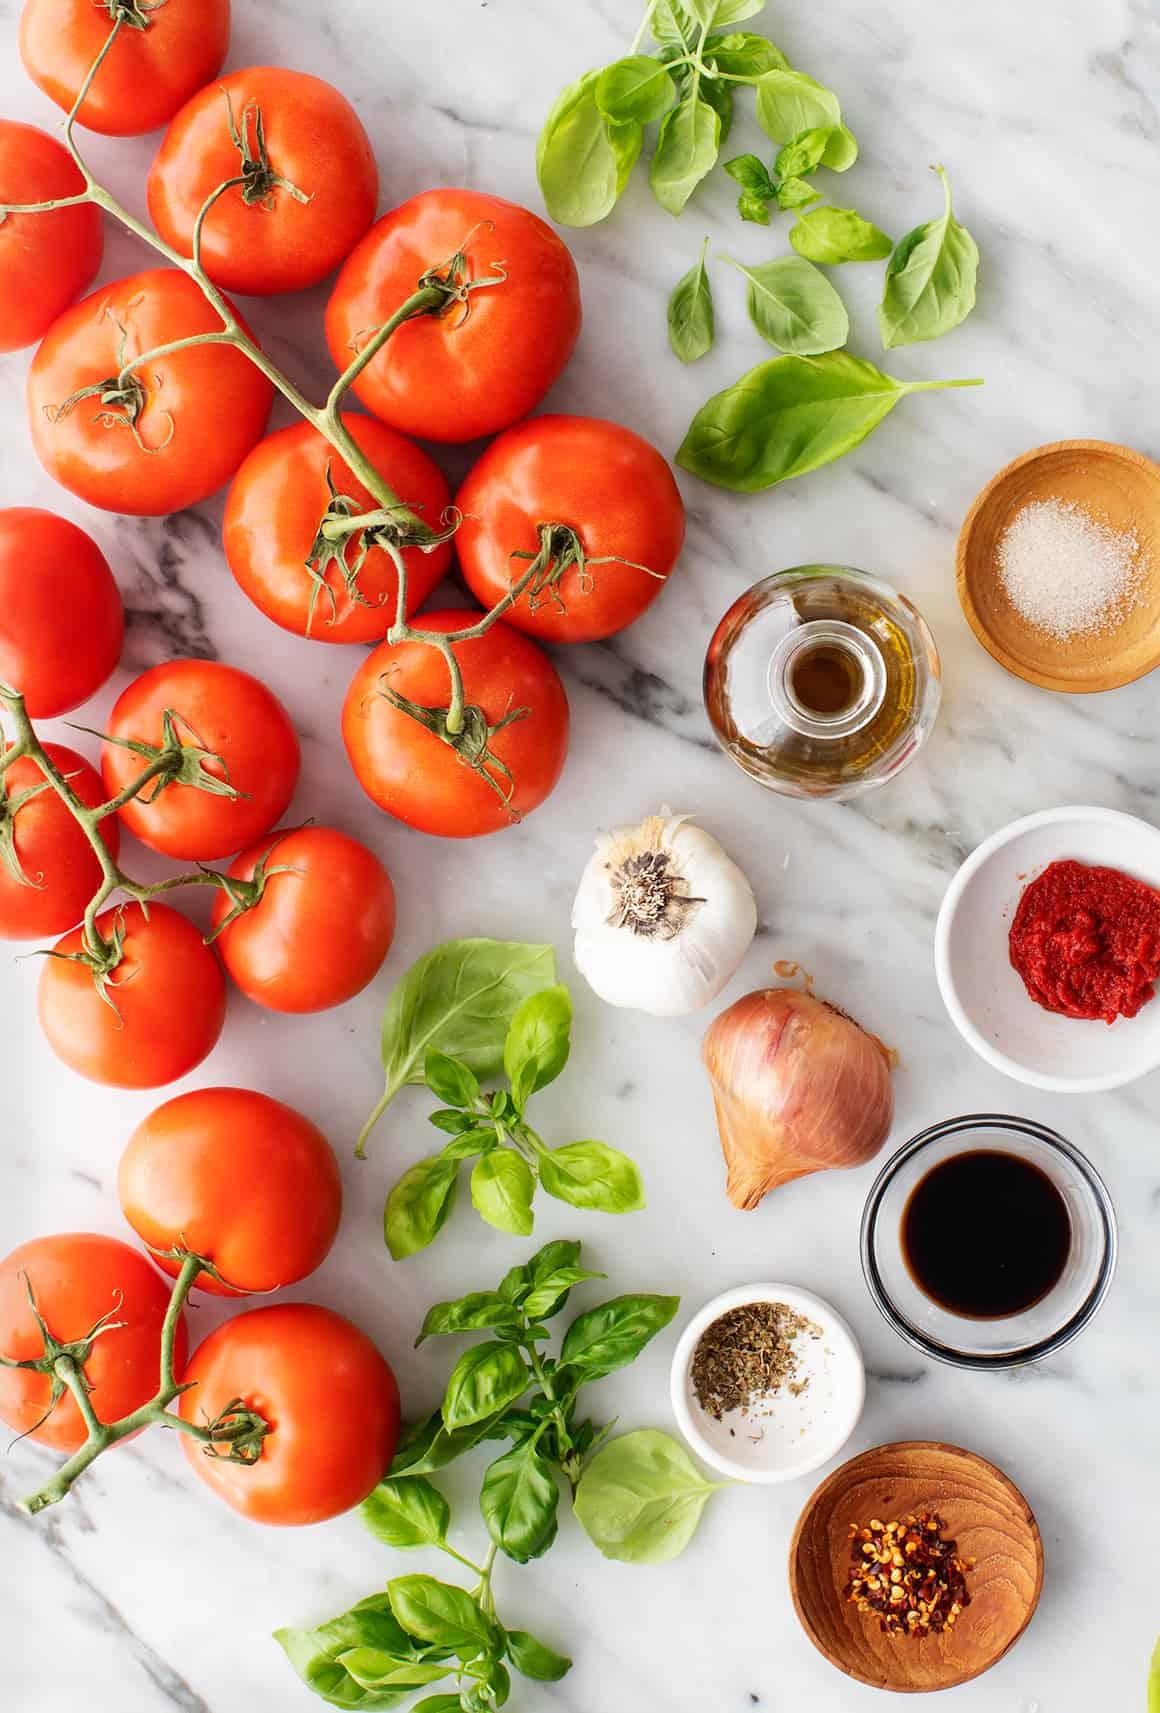 Tomato sauce recipe ingredients